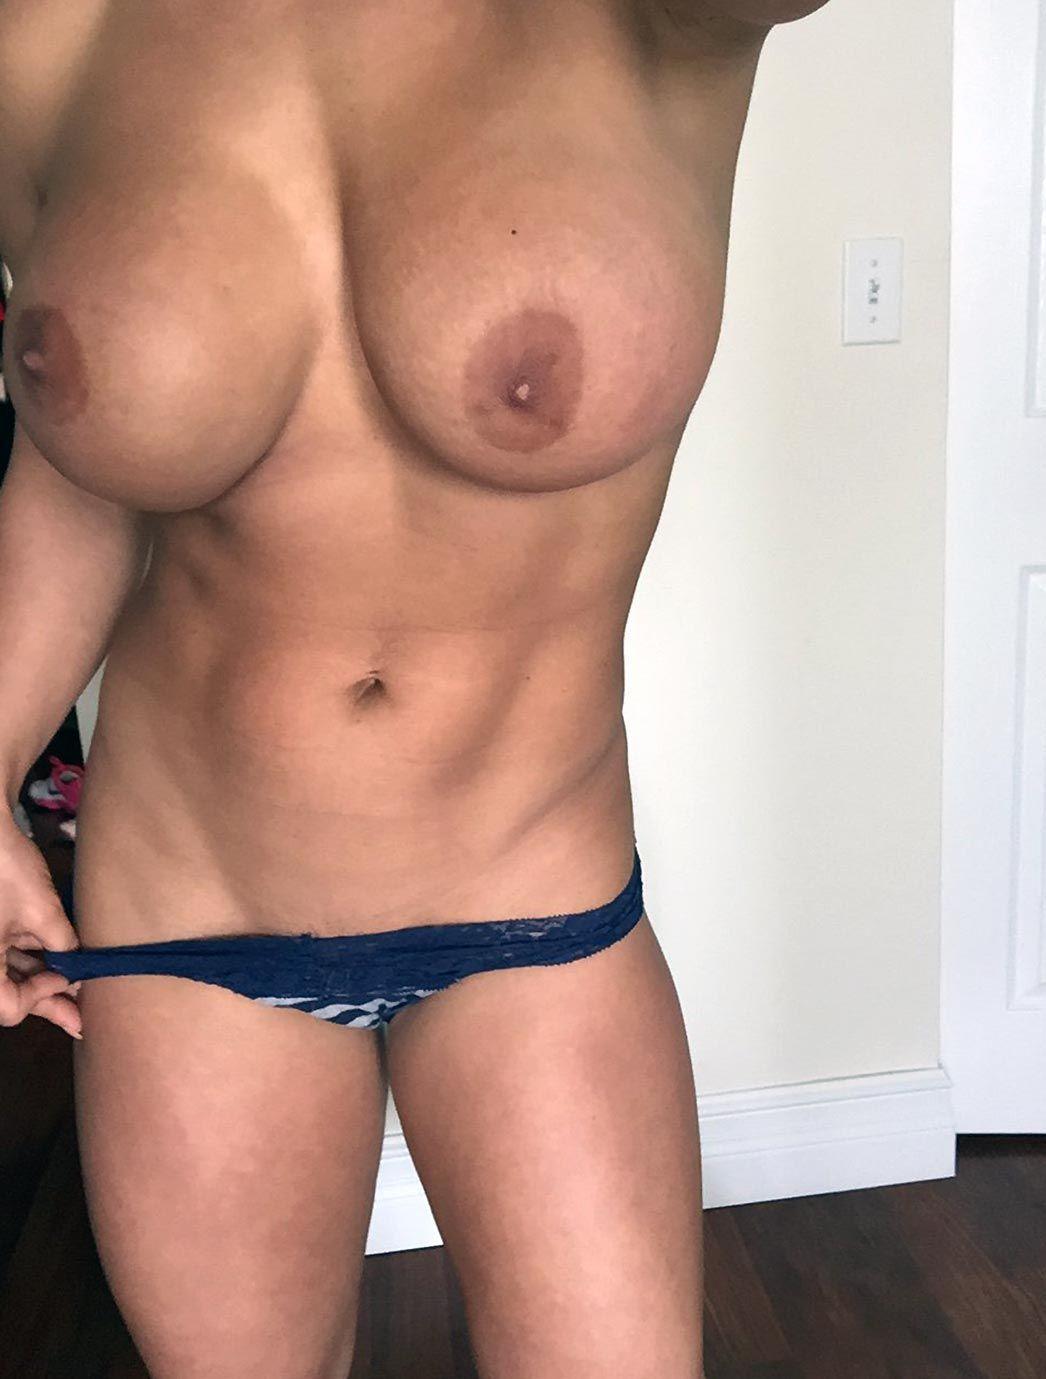 Celeste Bonin Nude Leaked The Fappening & Sexy 0172